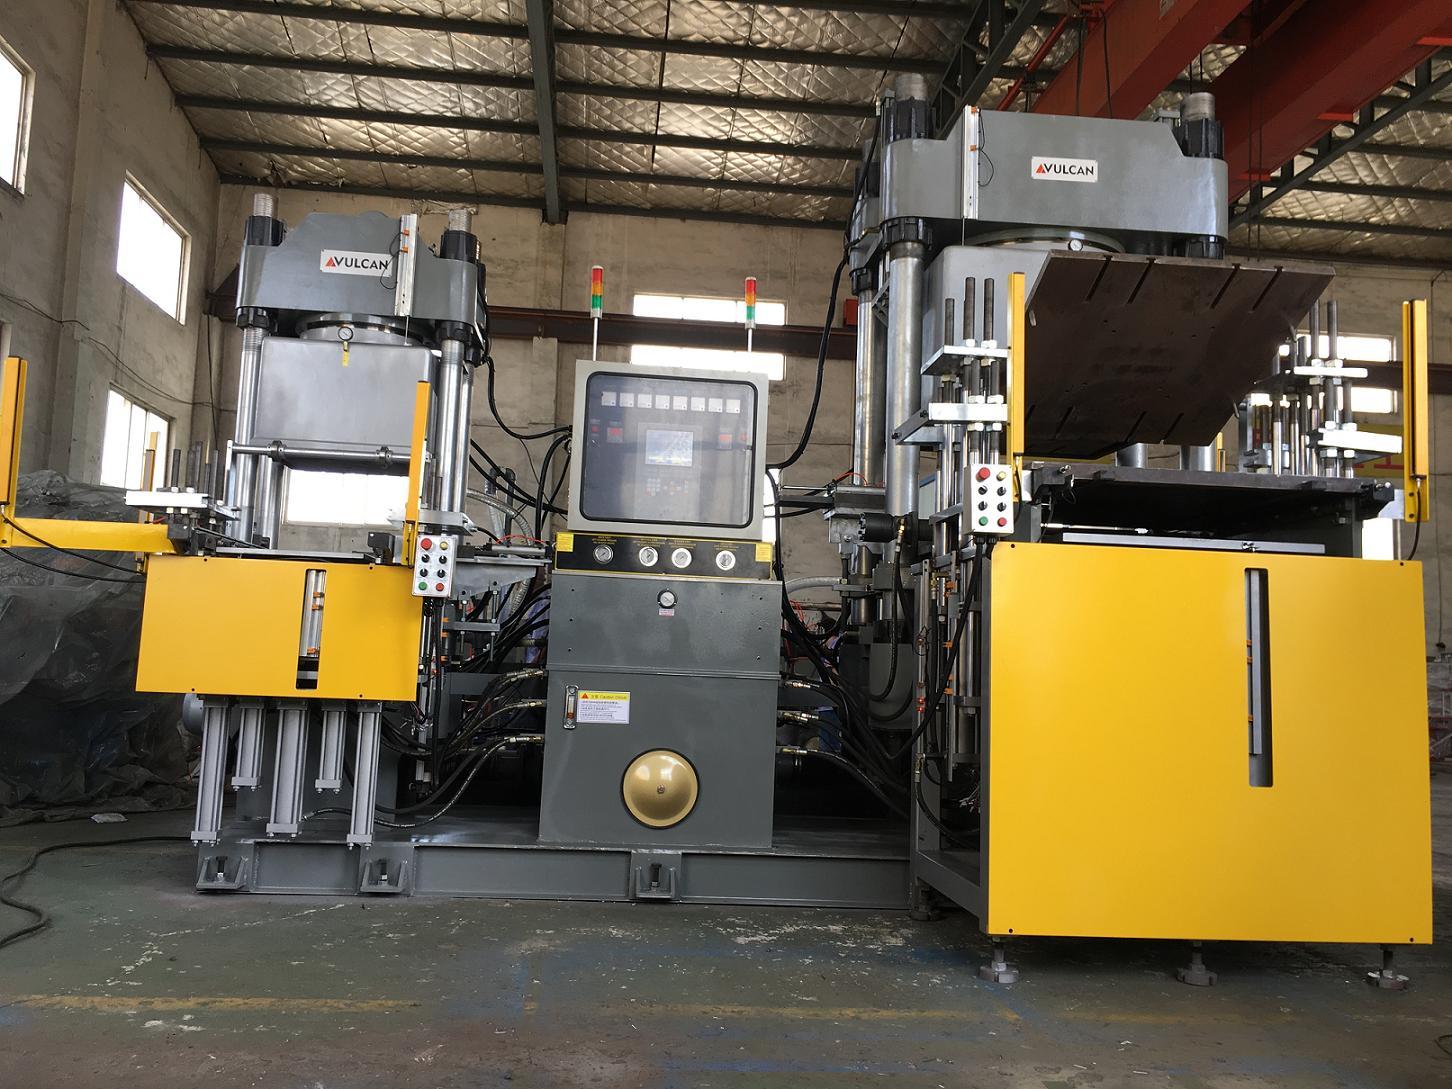 Vacuum Rubber Press,Vacuum Rubber Compression Molding Machine,Vacuum Rubber Molding Machine